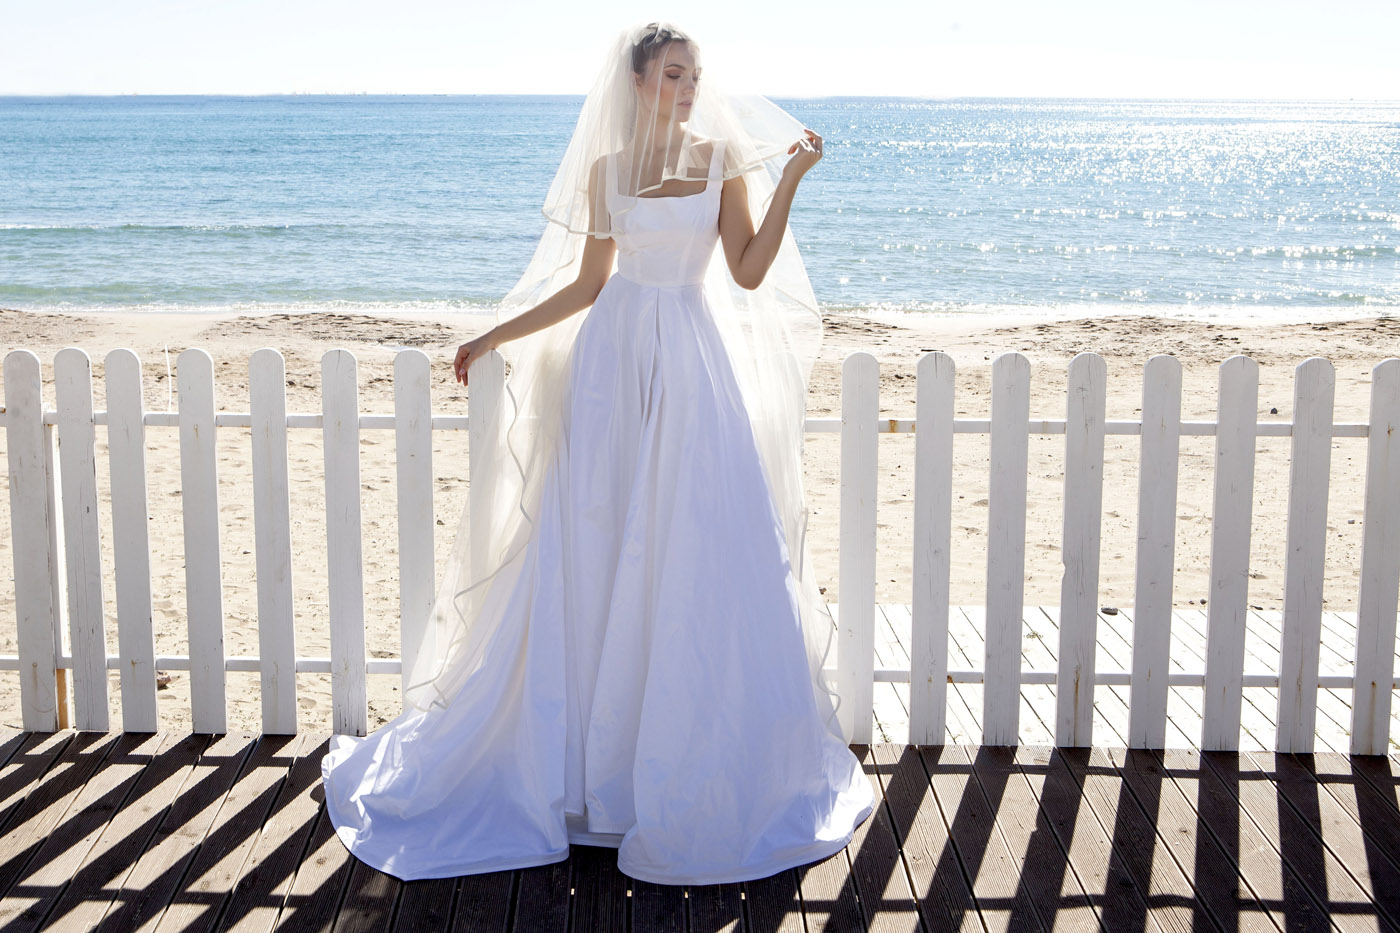 67d752158b53 Νυφικά - Yianna Couture - Οίκος Νυφικών - Αθήνα Ερμού